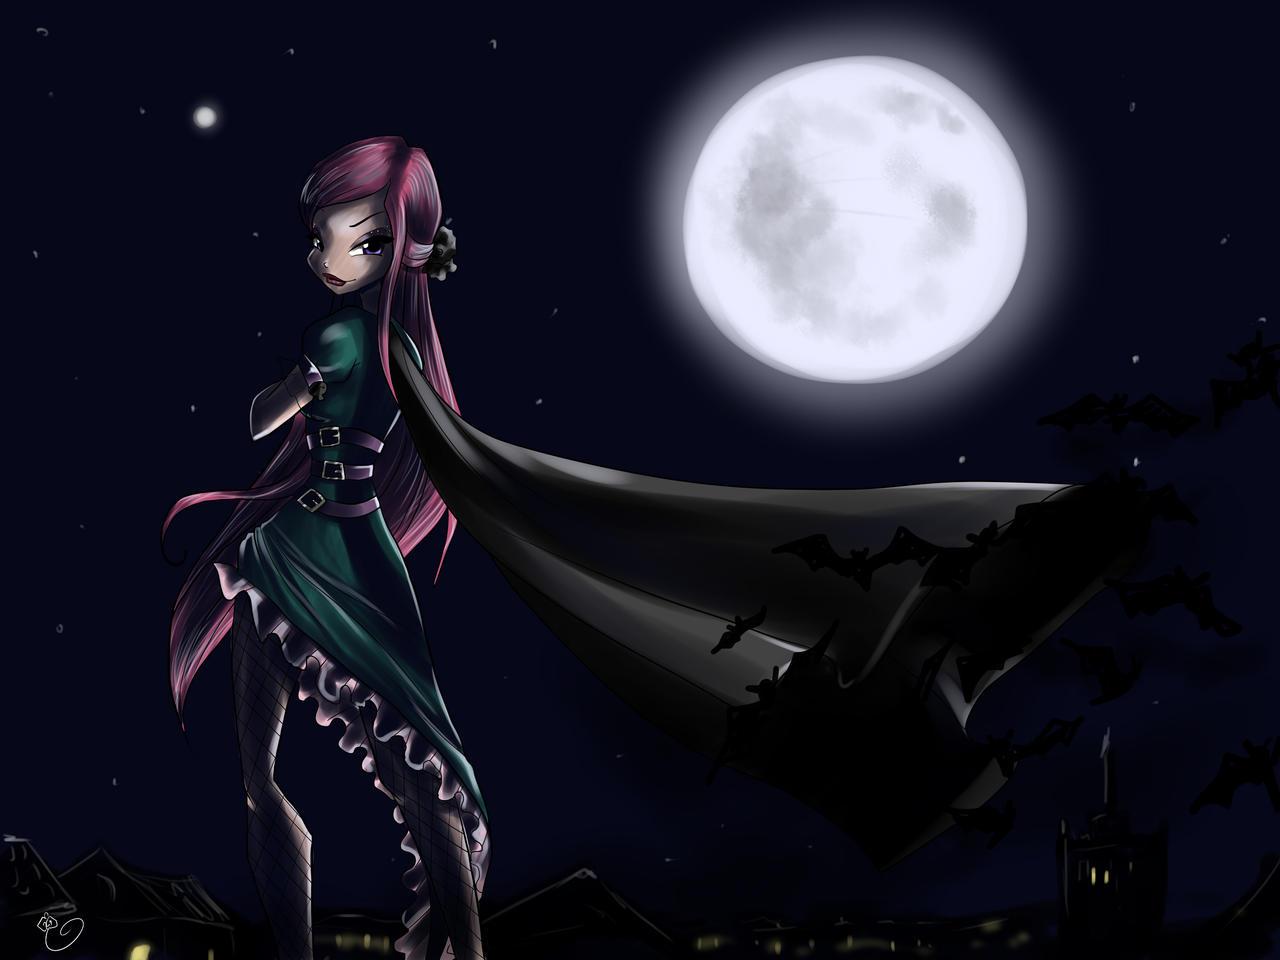 Roxy Happy Halloween by fantazyme